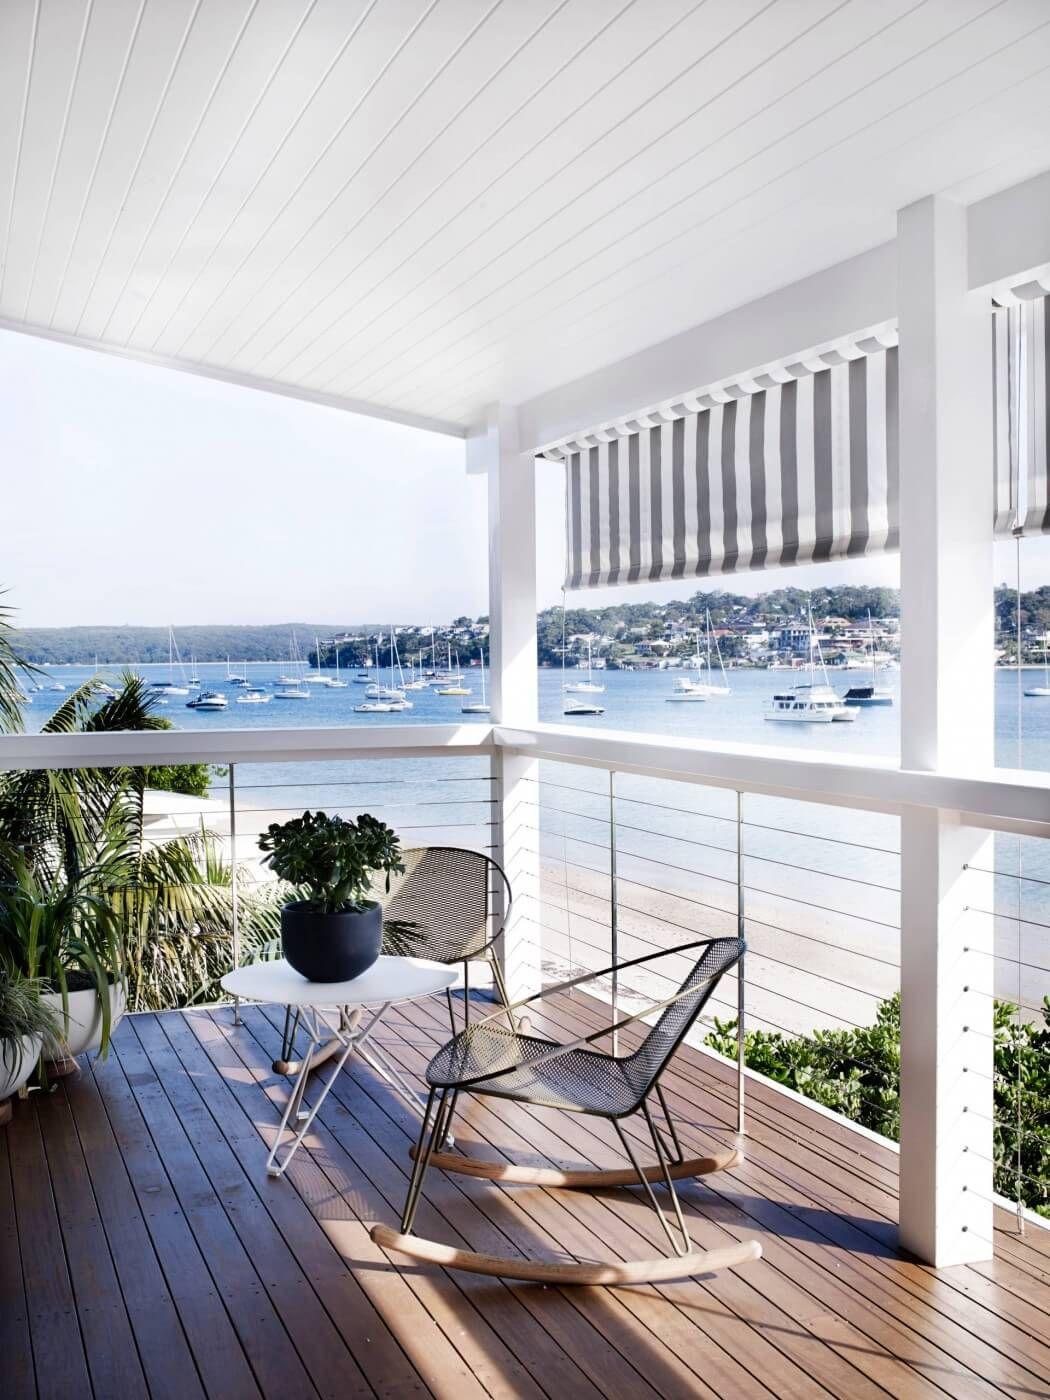 Deck Railing Ideas Australia